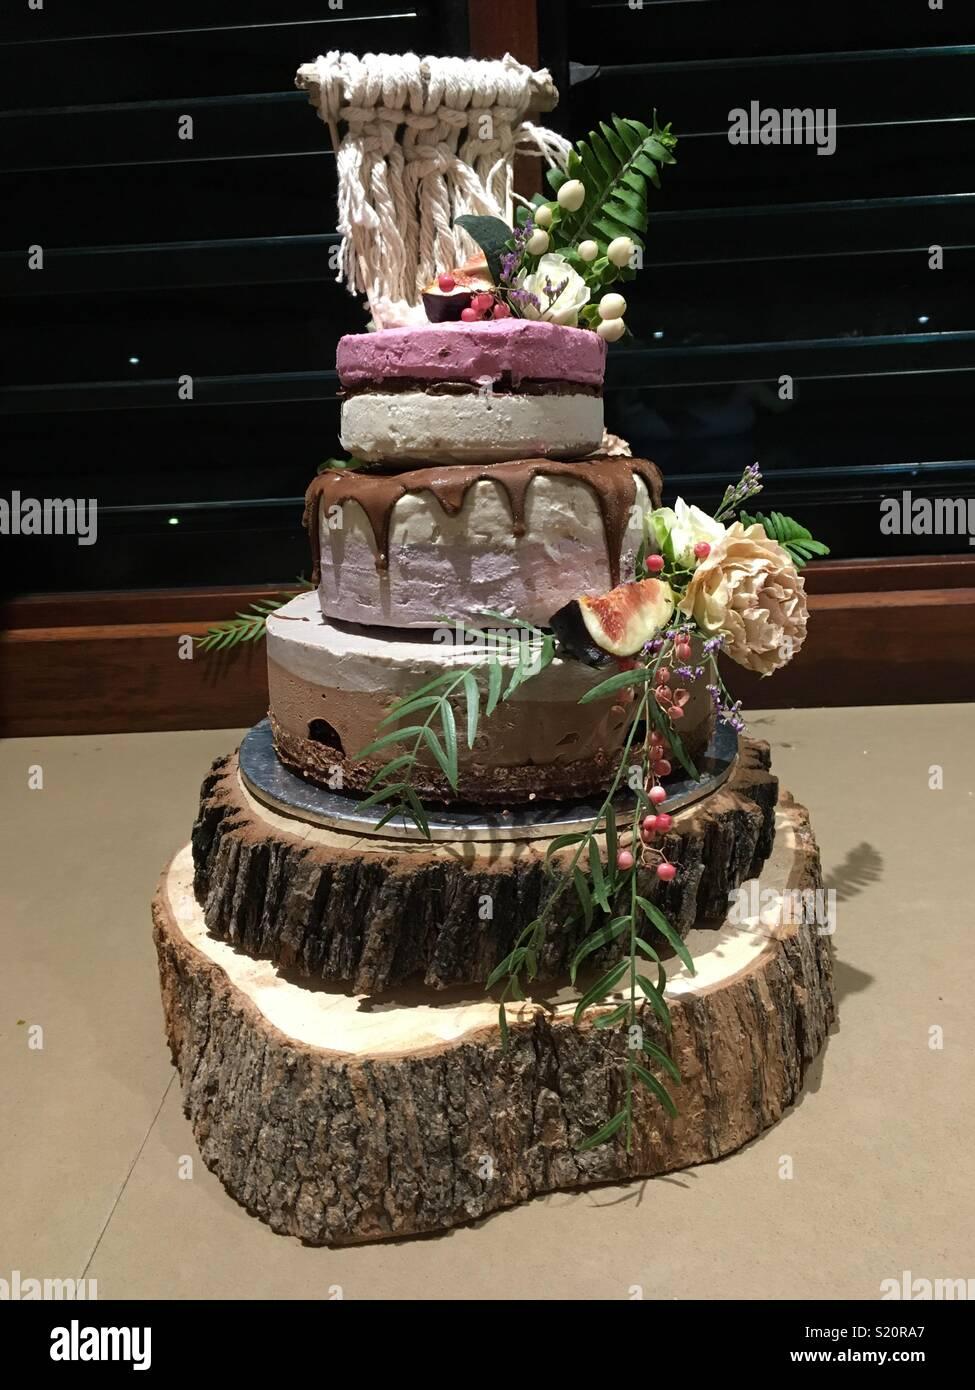 Raw vegan wedding cake with flowers and fruit Stock Photo